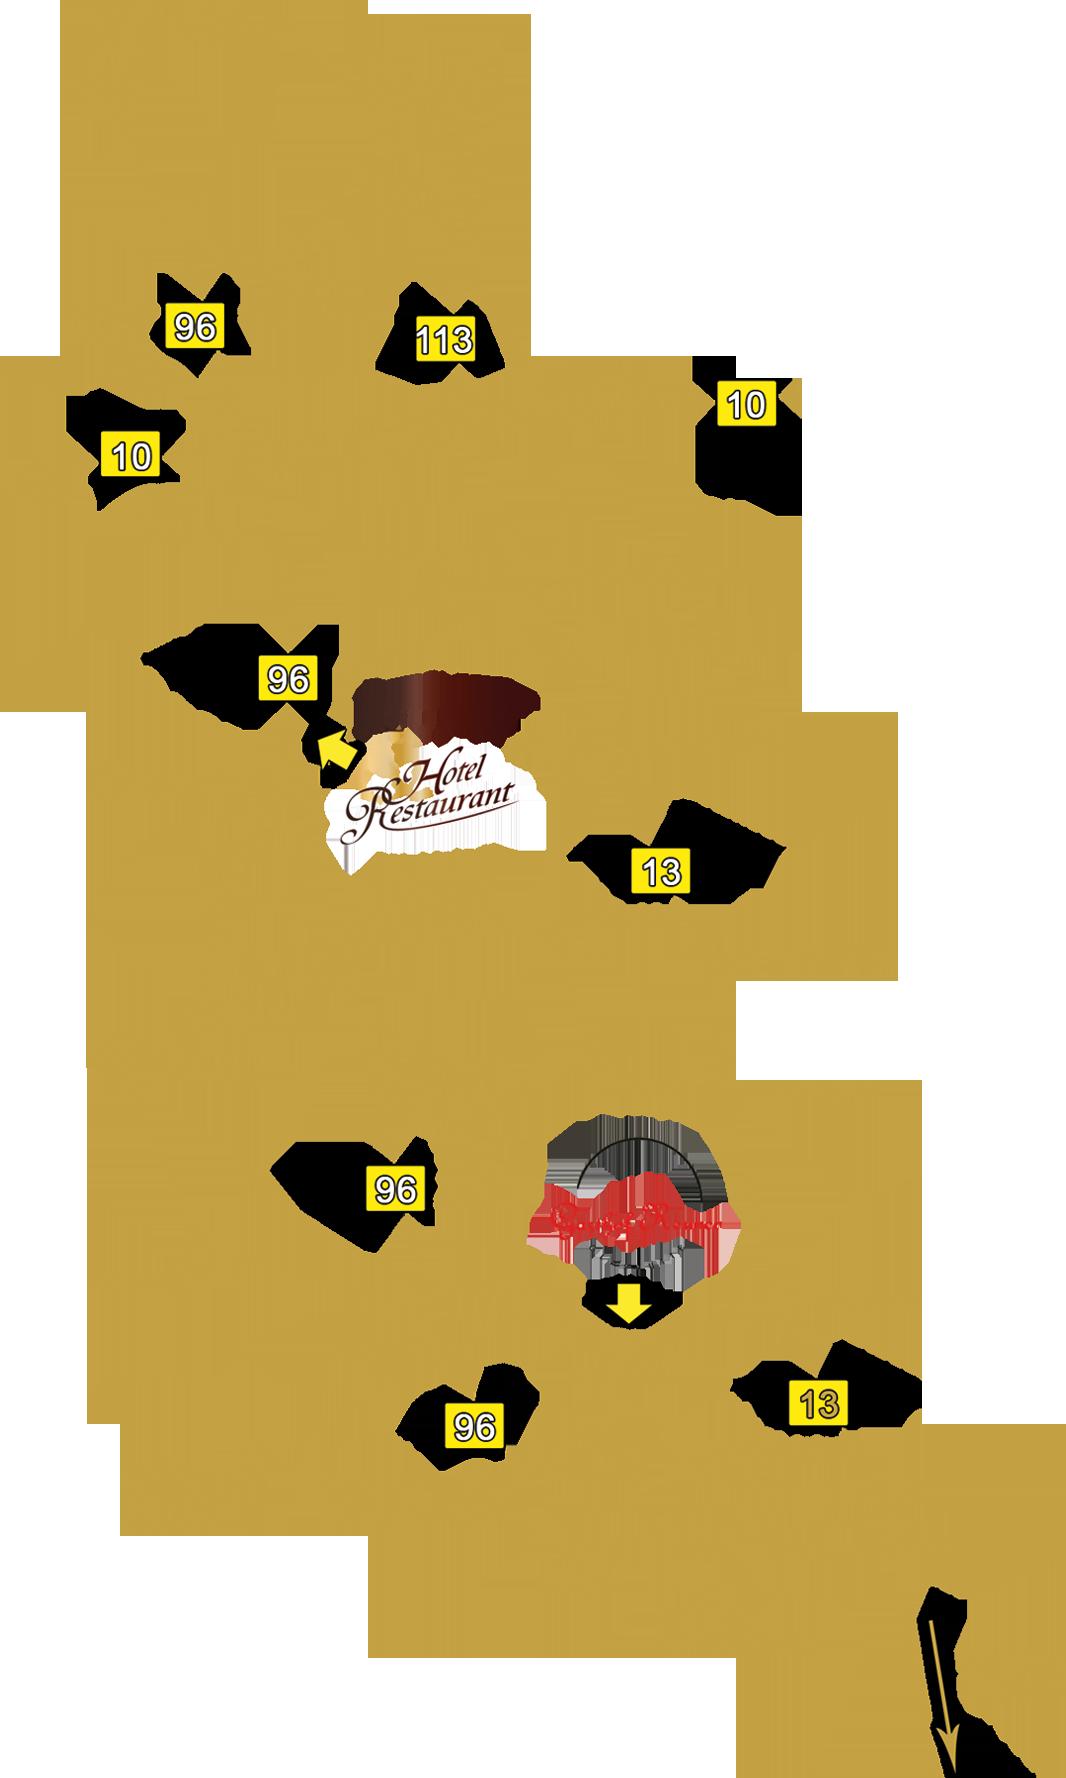 Lage & Anfahrt